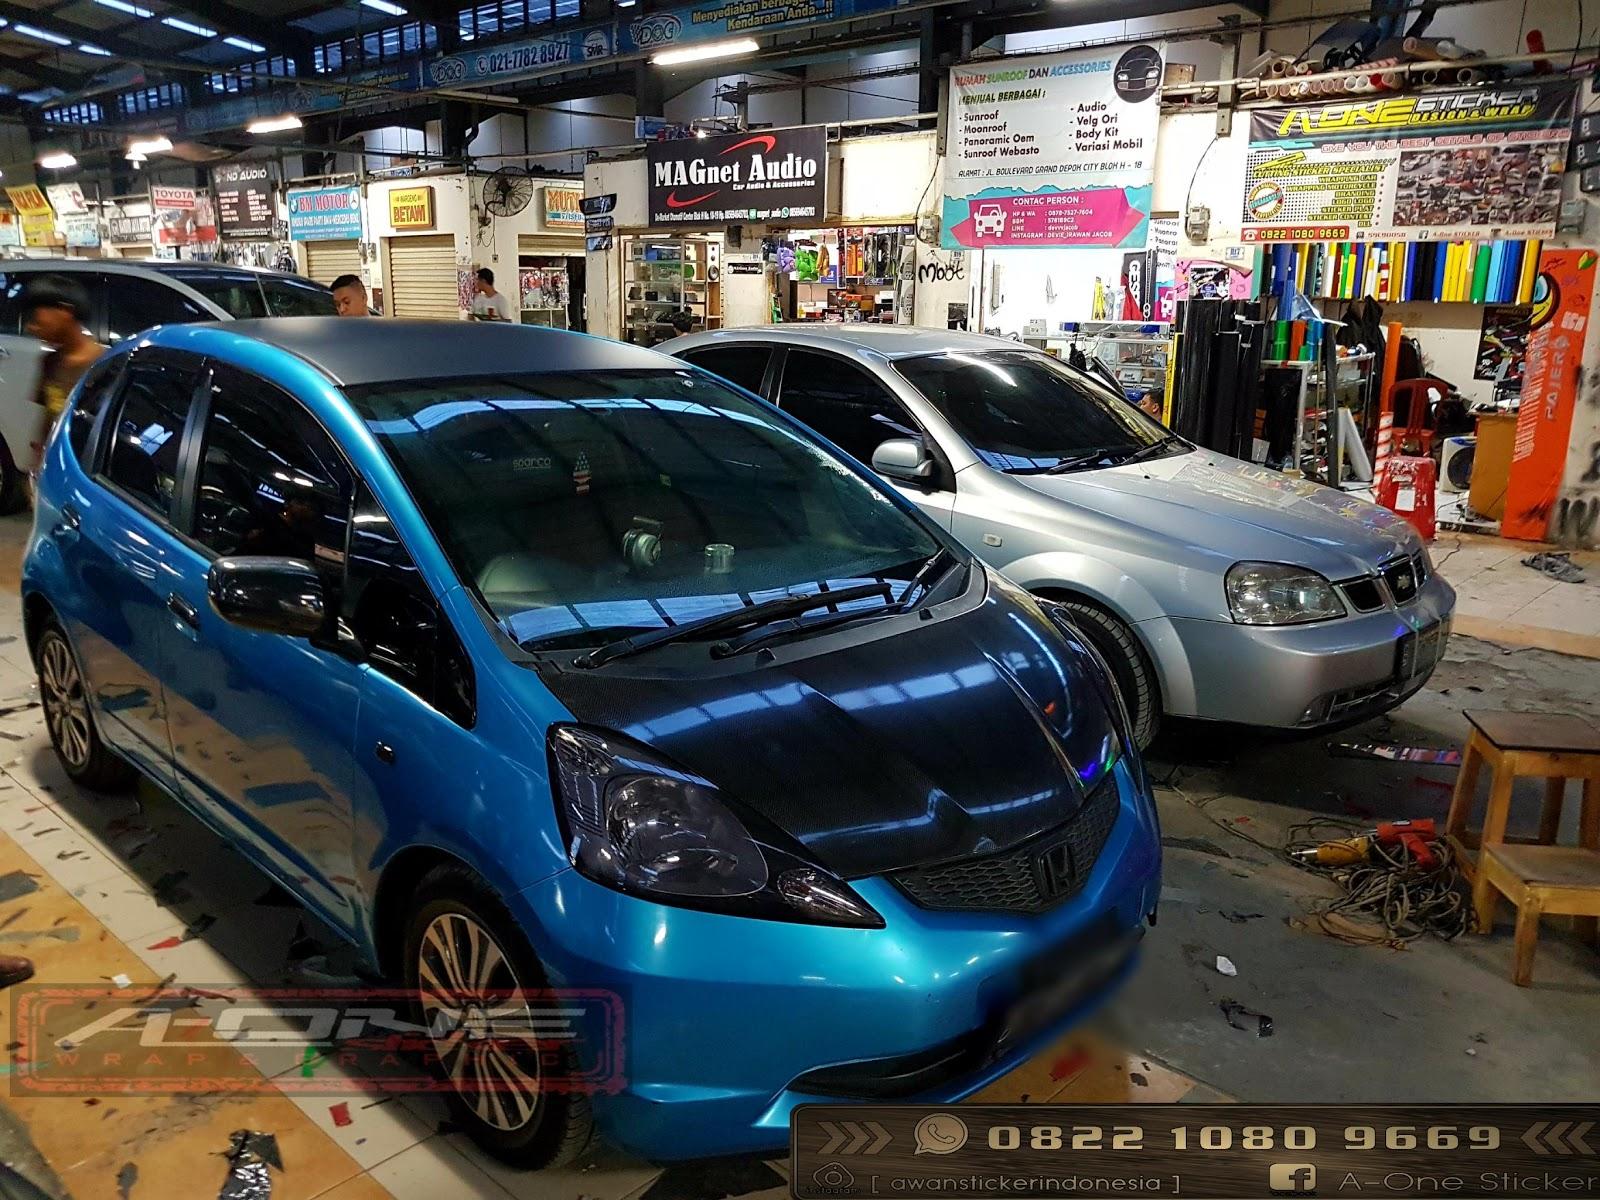 Cutting Sticker Mobil Modifikasi Sticker Depok Jakarta Bogor Honda